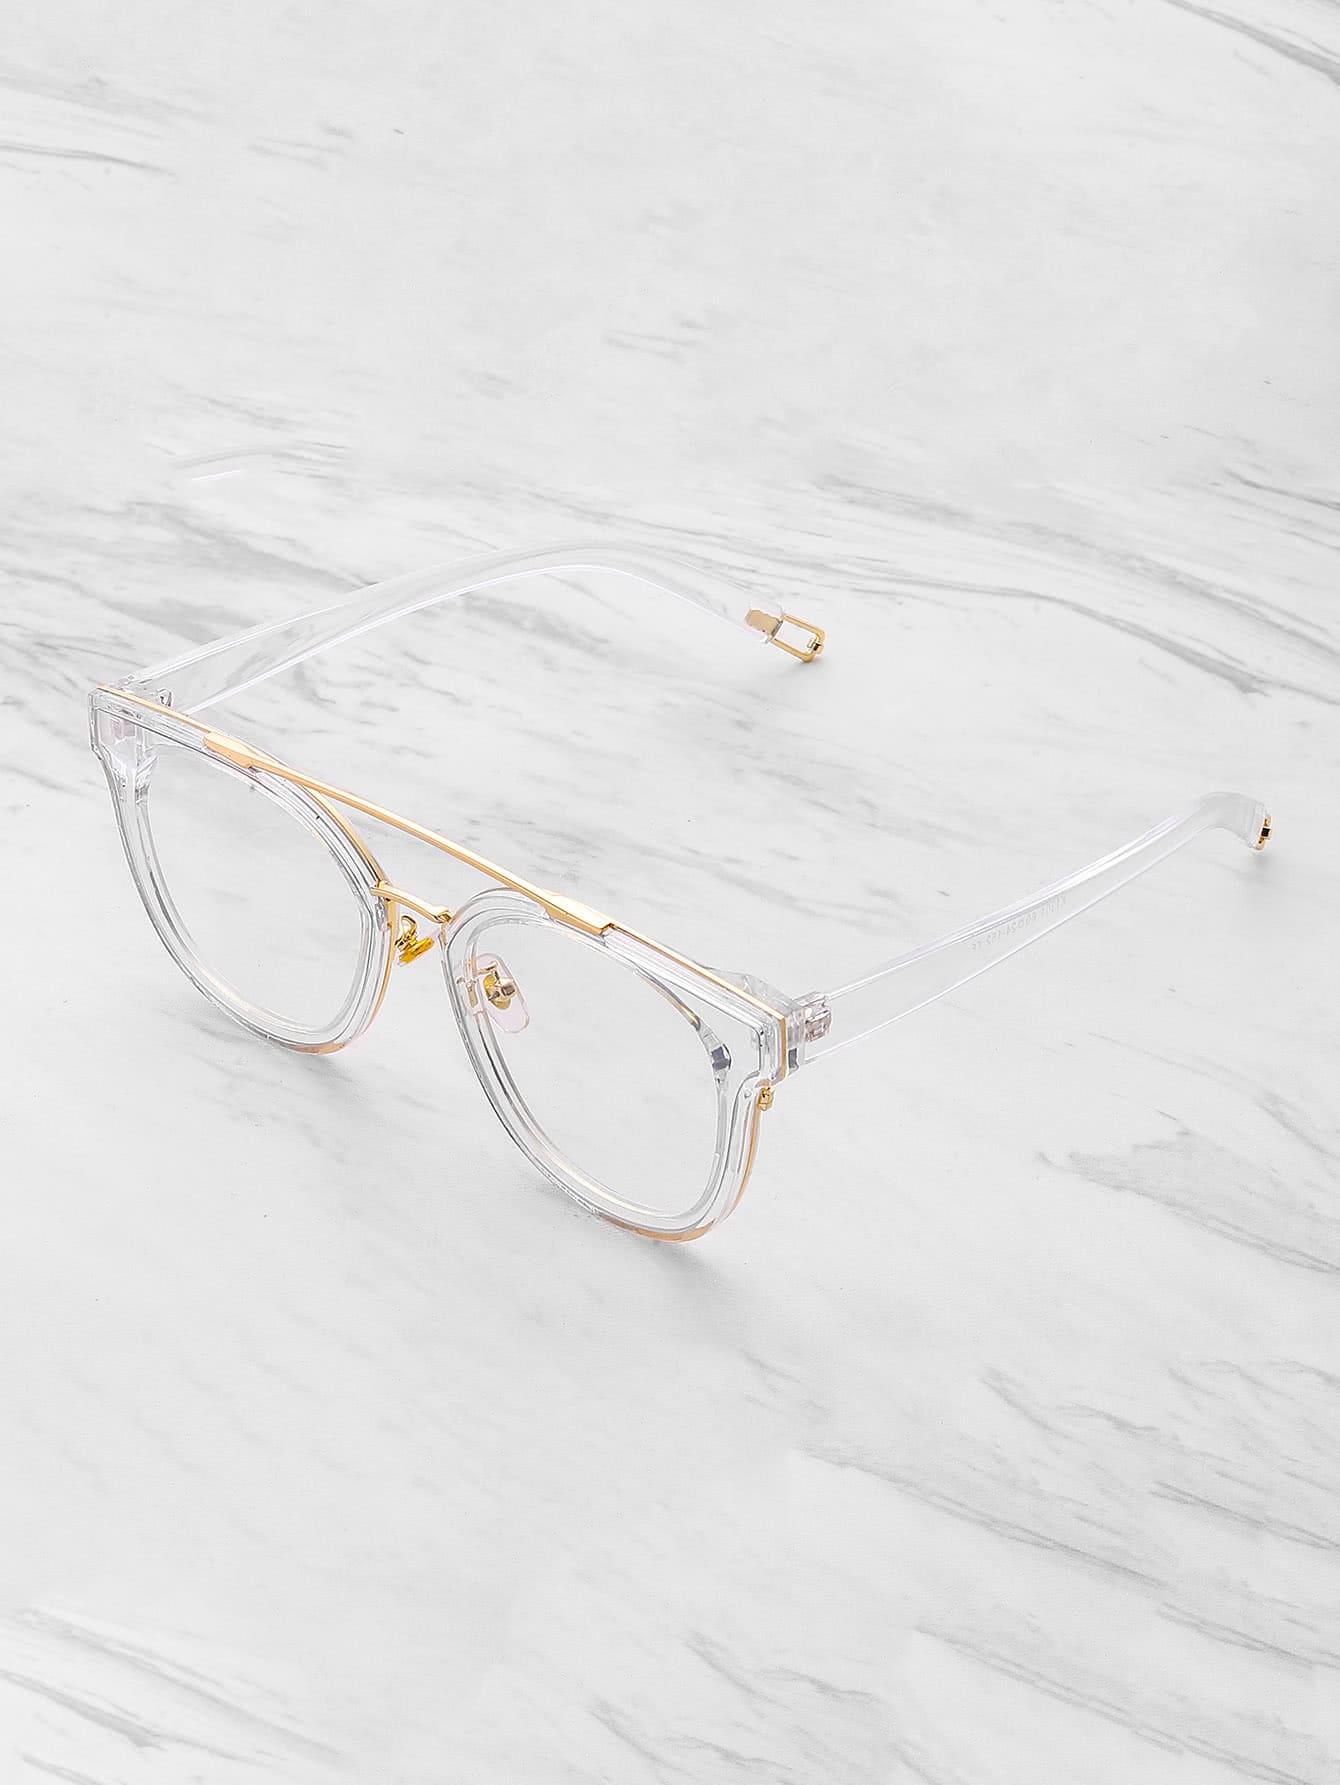 727b407596 Metal Top Bar Clear Frame Glasses EmmaCloth-Women Fast Fashion ...